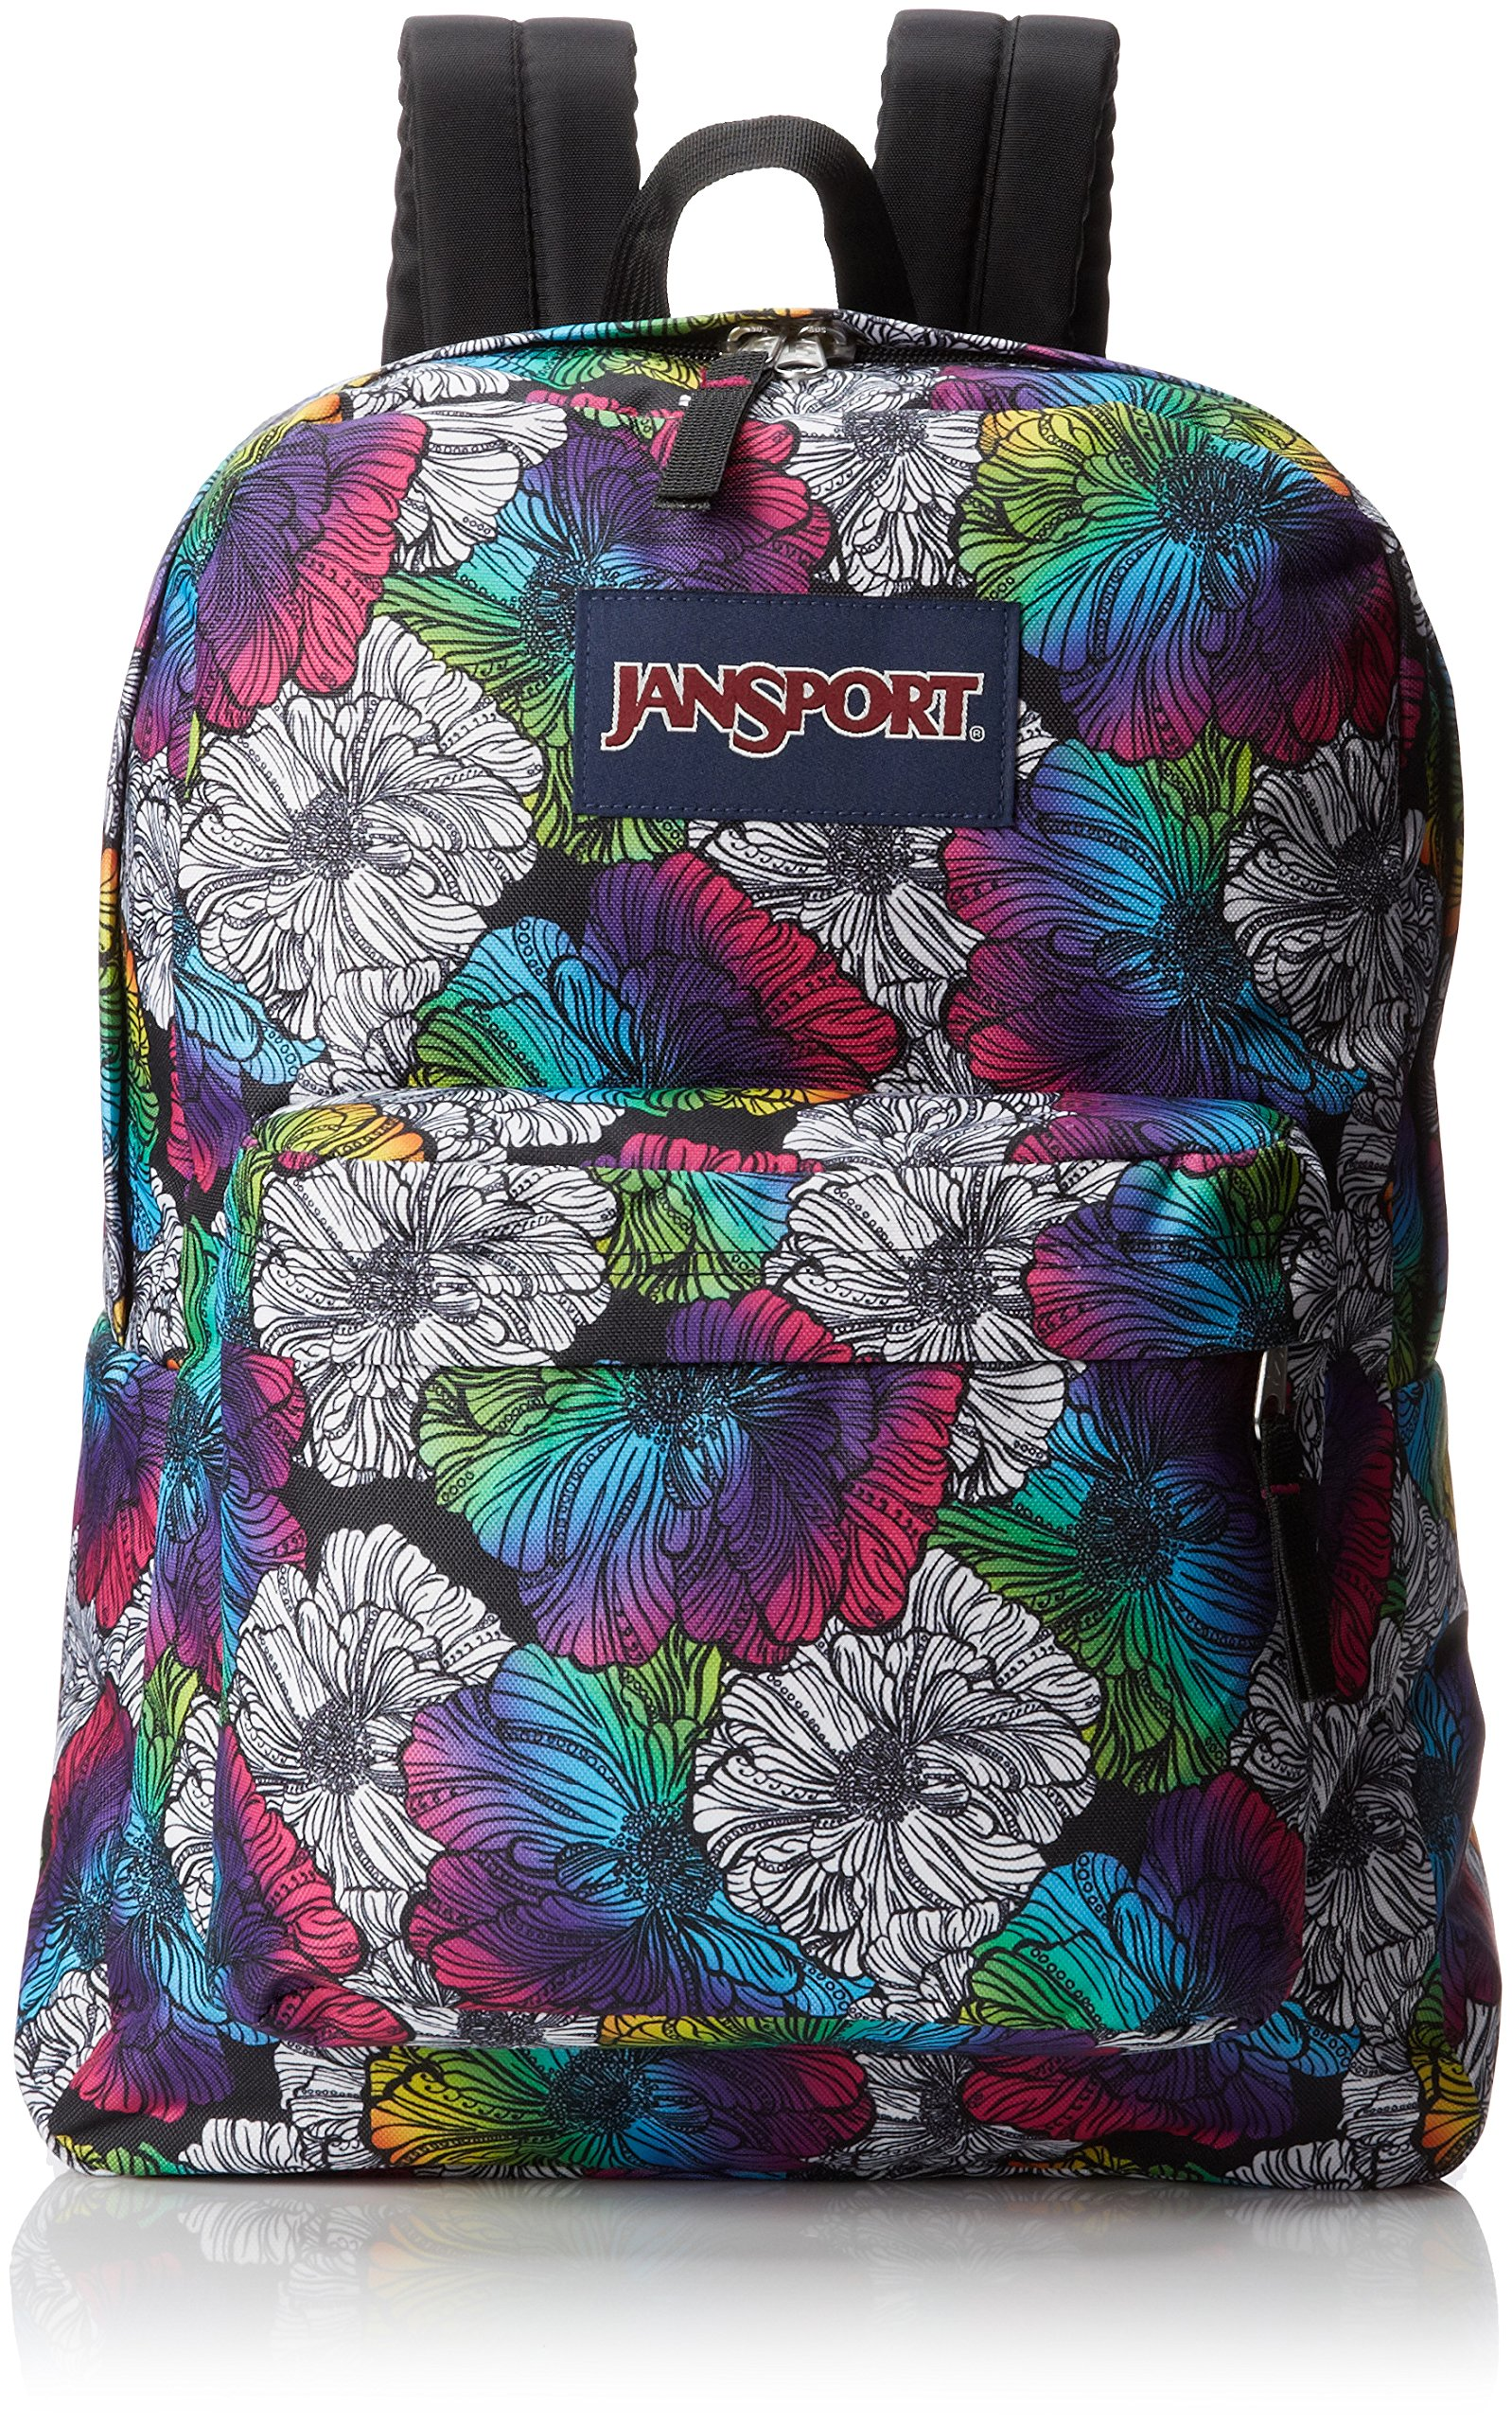 JanSport Superbreak Backpack - Multi Ombre Floral / 16.7H x 13W x 8.5D